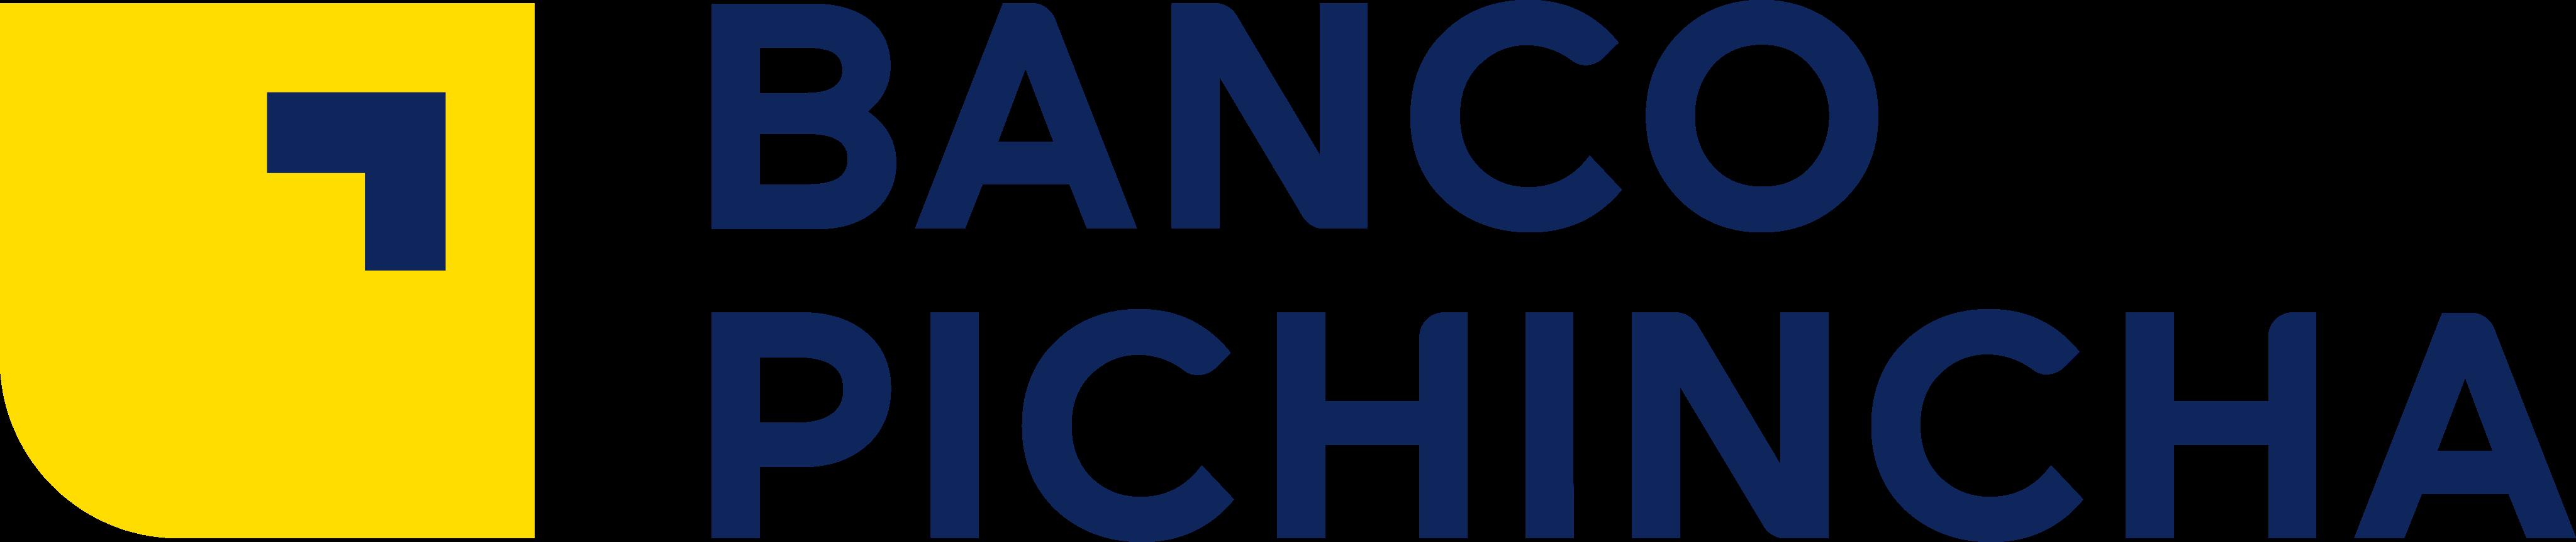 banco pichincha logo - Banco Pichincha Logo